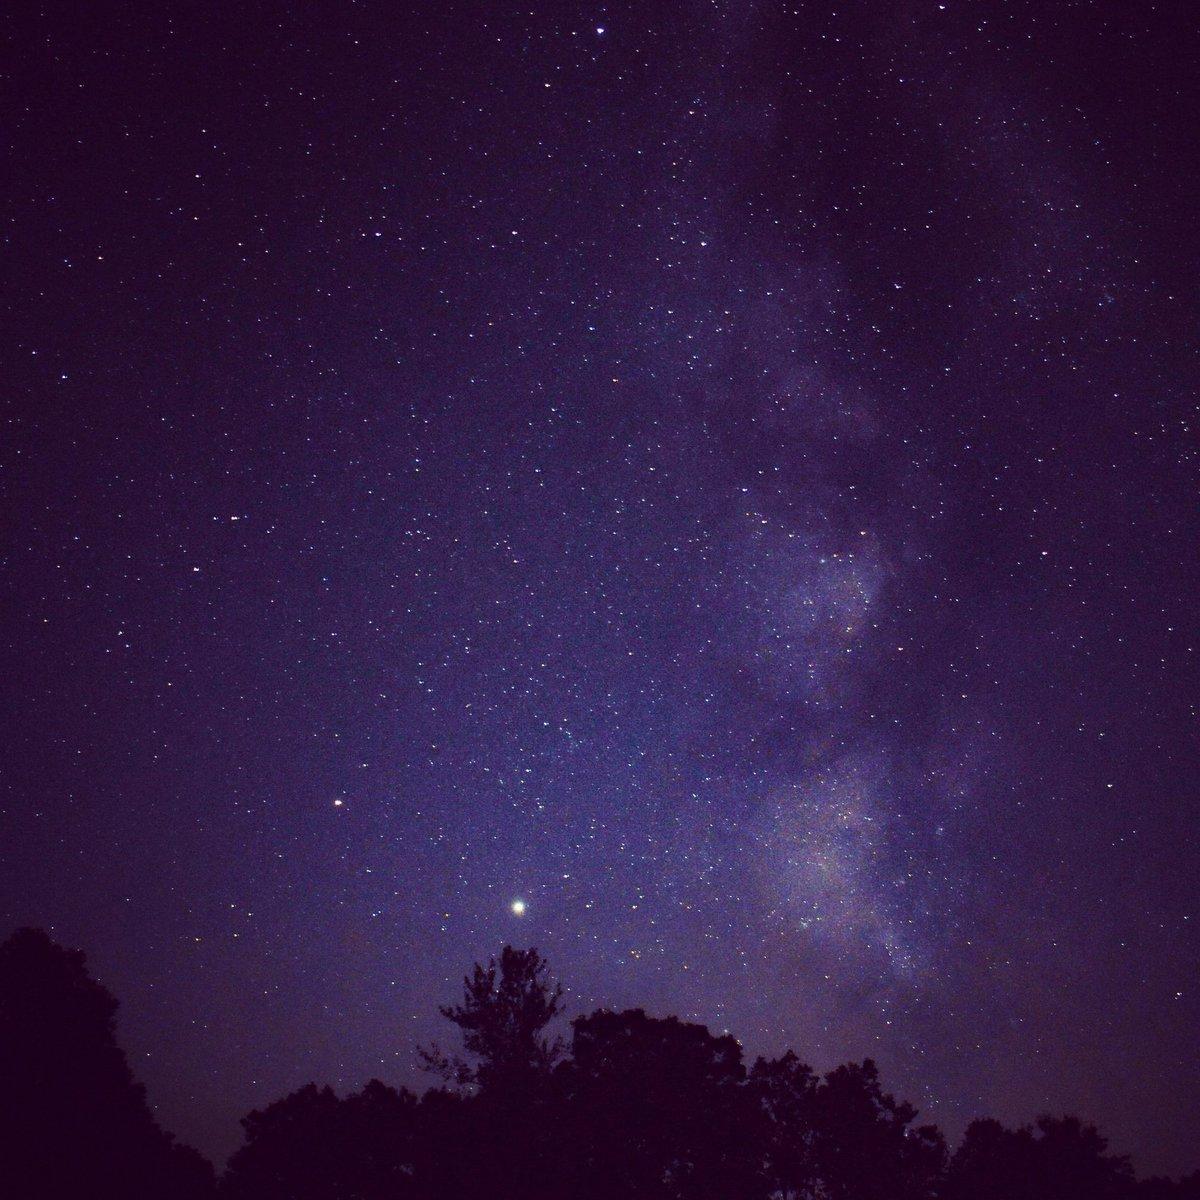 Good night from Oak Mountain Hideaway & their beautiful dark skies. This lovely photo was taken by innkeeper Anna Marie last night!  #visitclearfieldcounty #oakmountainhideaway #socialmediatakeover  @midatlanticdaytrips #midatlanticdaytripsblog #ClearfieldCoAdventures